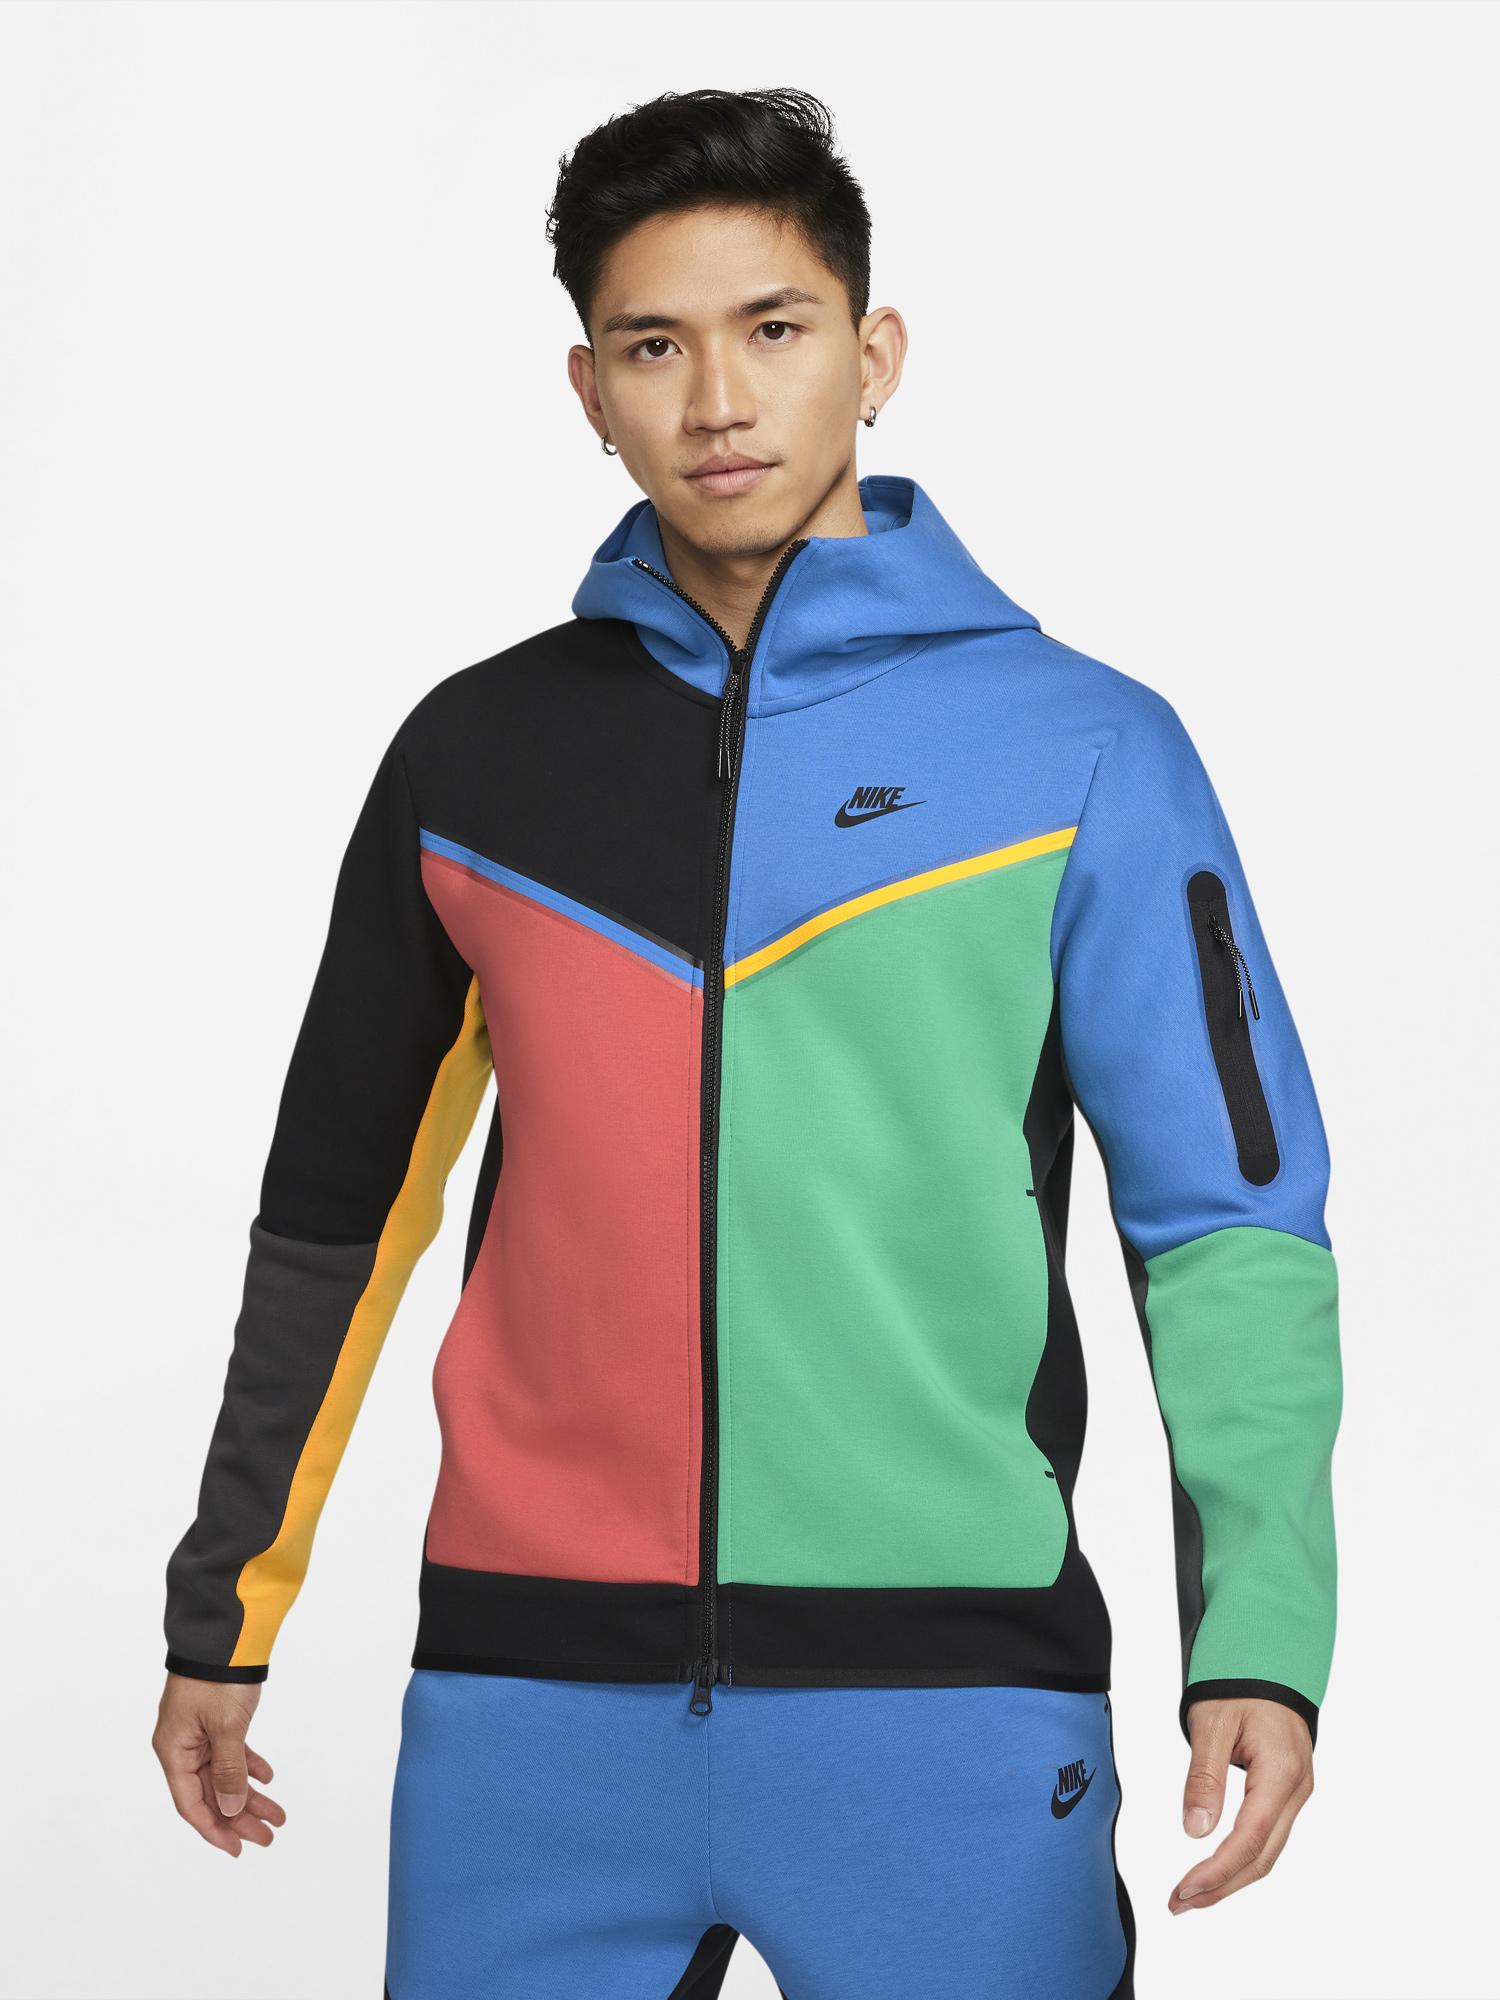 nike-tech-flece-multi-color-hoodie-blue-green-red-1